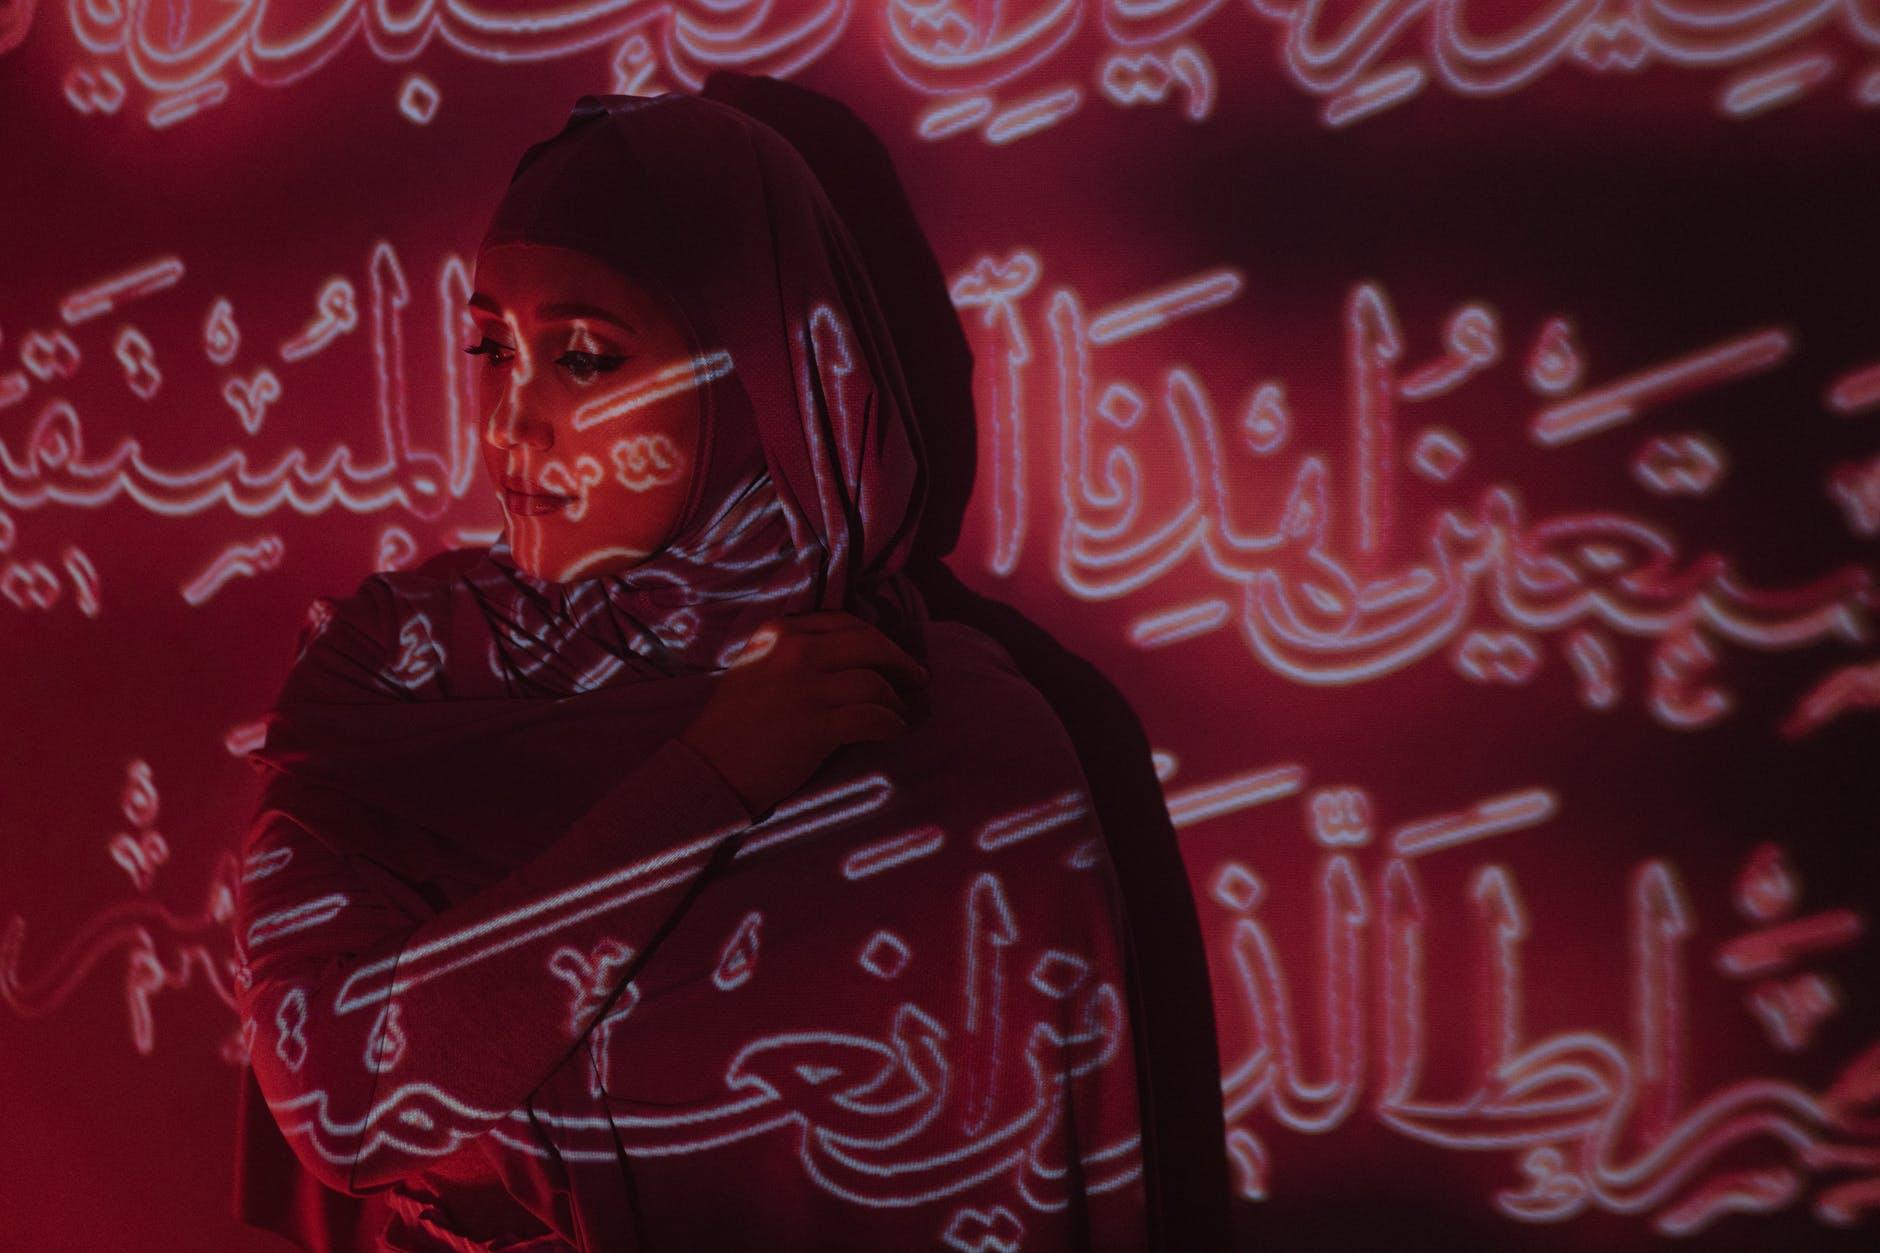 Curso de árabe fácil